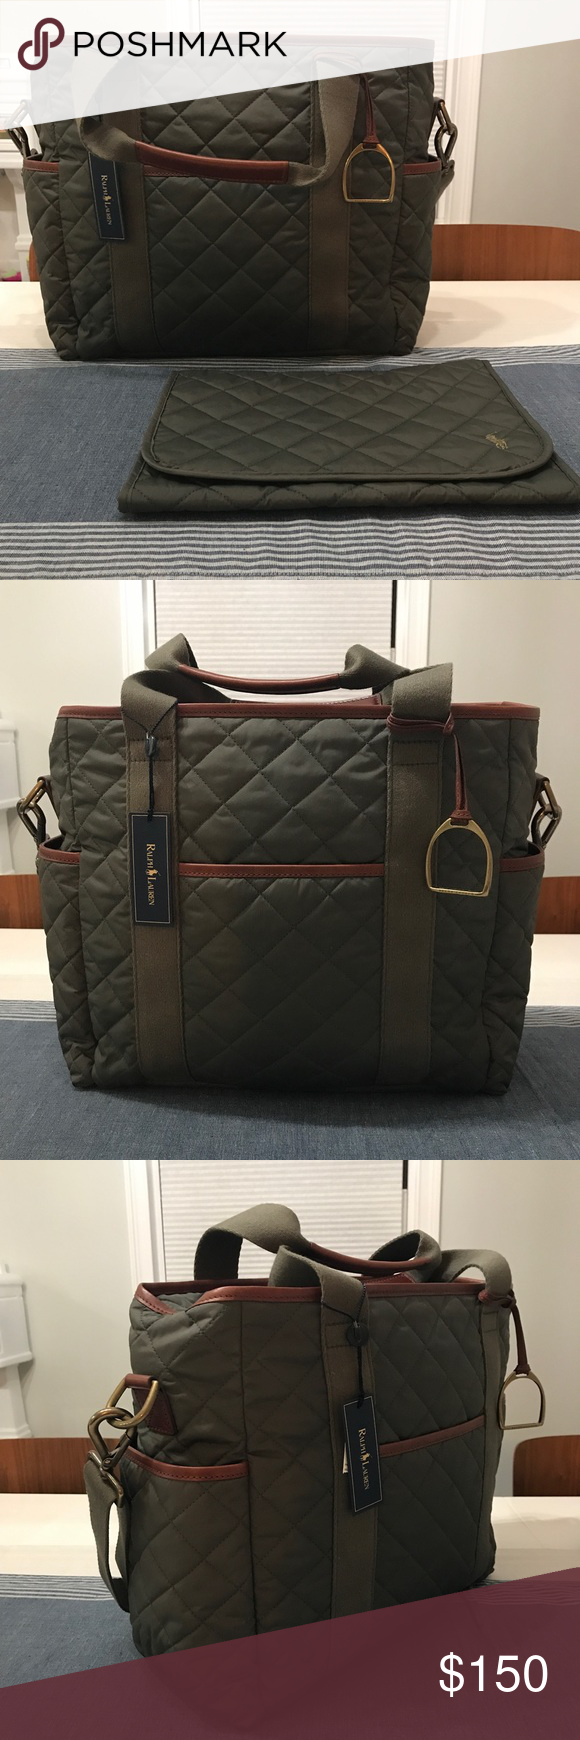 Tags Bag Ralph Brand Polo Lauren With Diaper New 354LqcARj